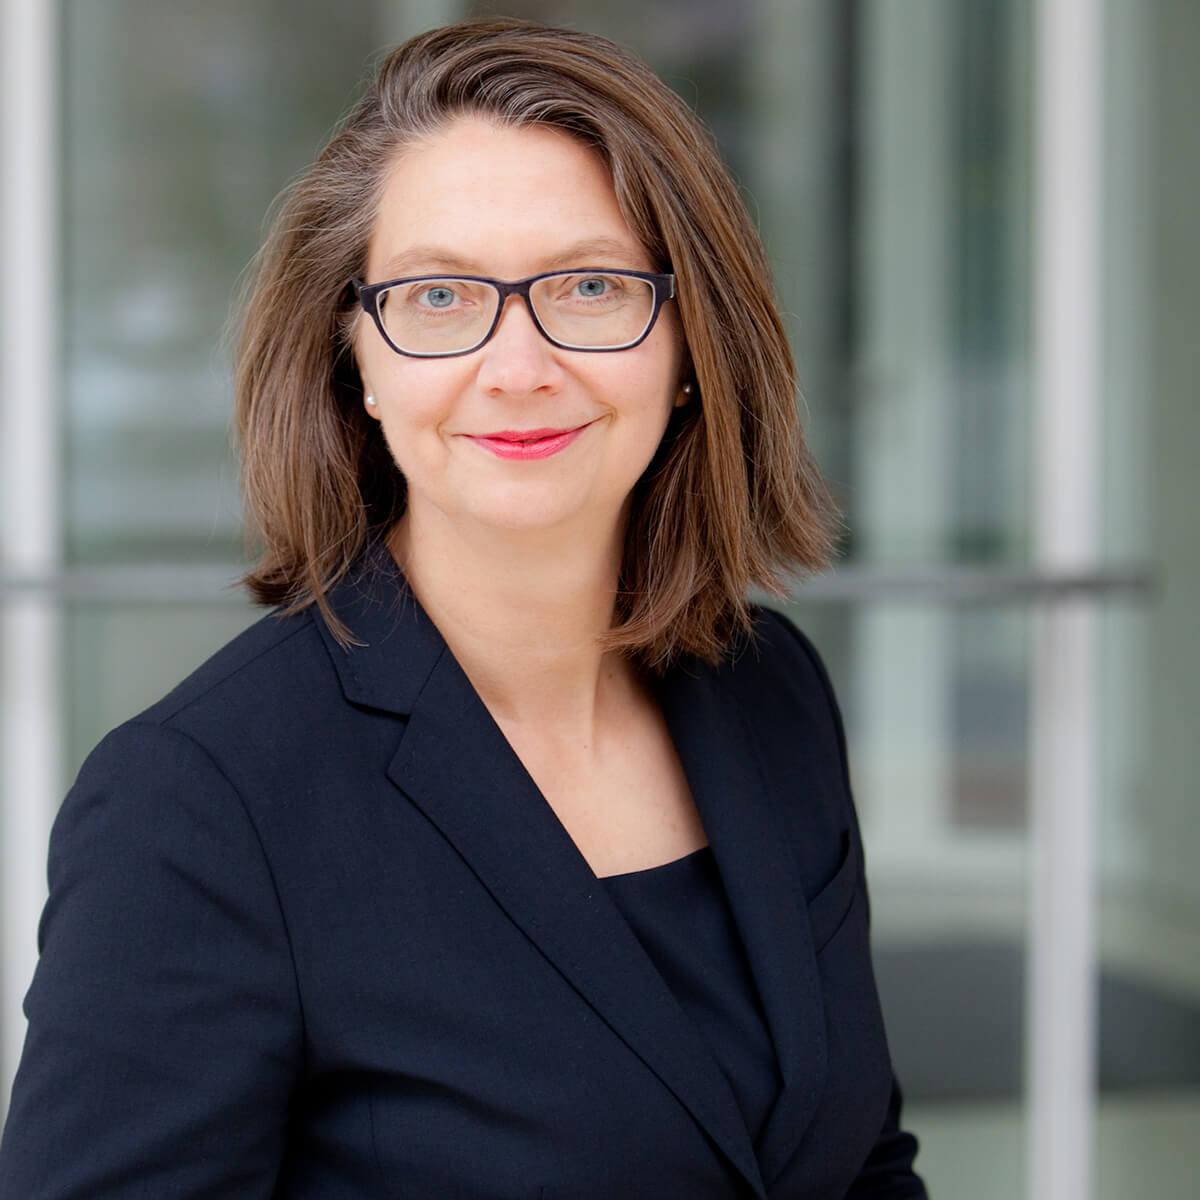 Margret Schulenburg